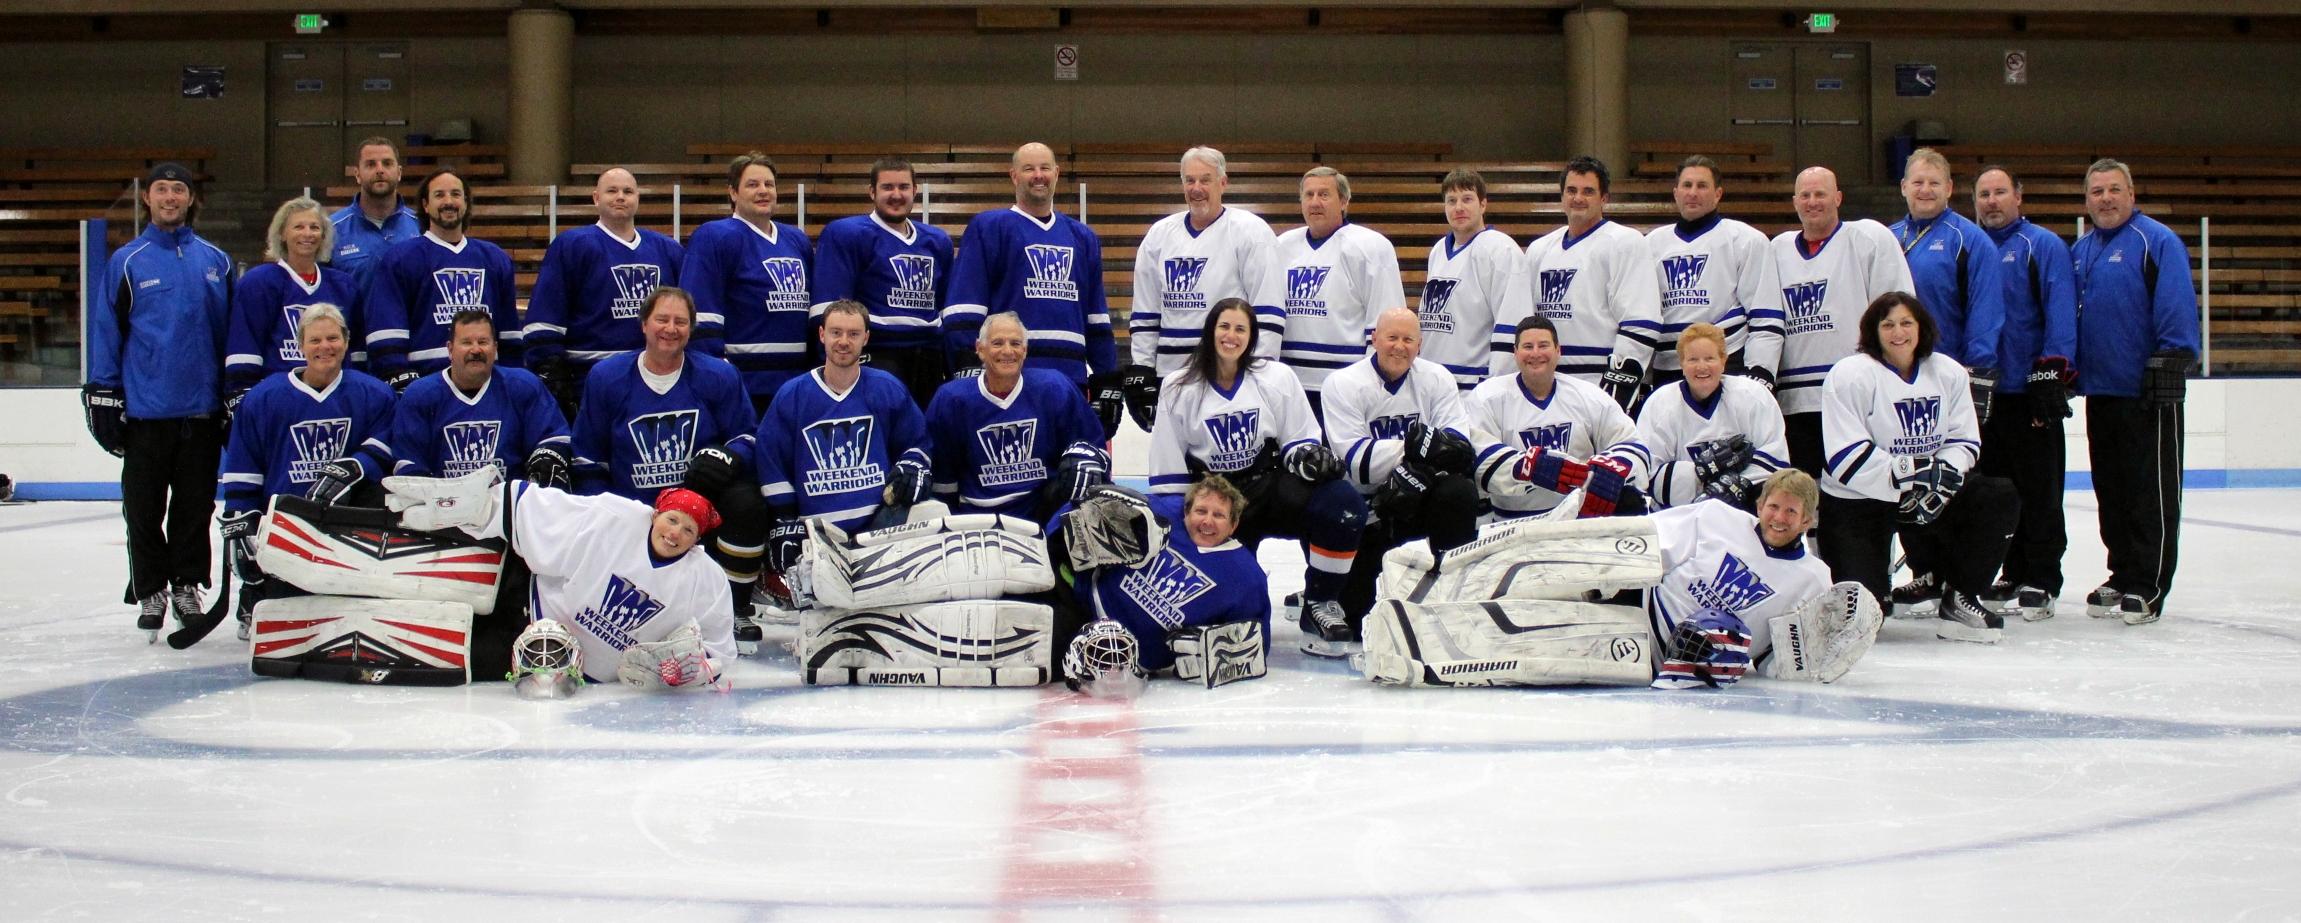 Vail Team Photo 2015